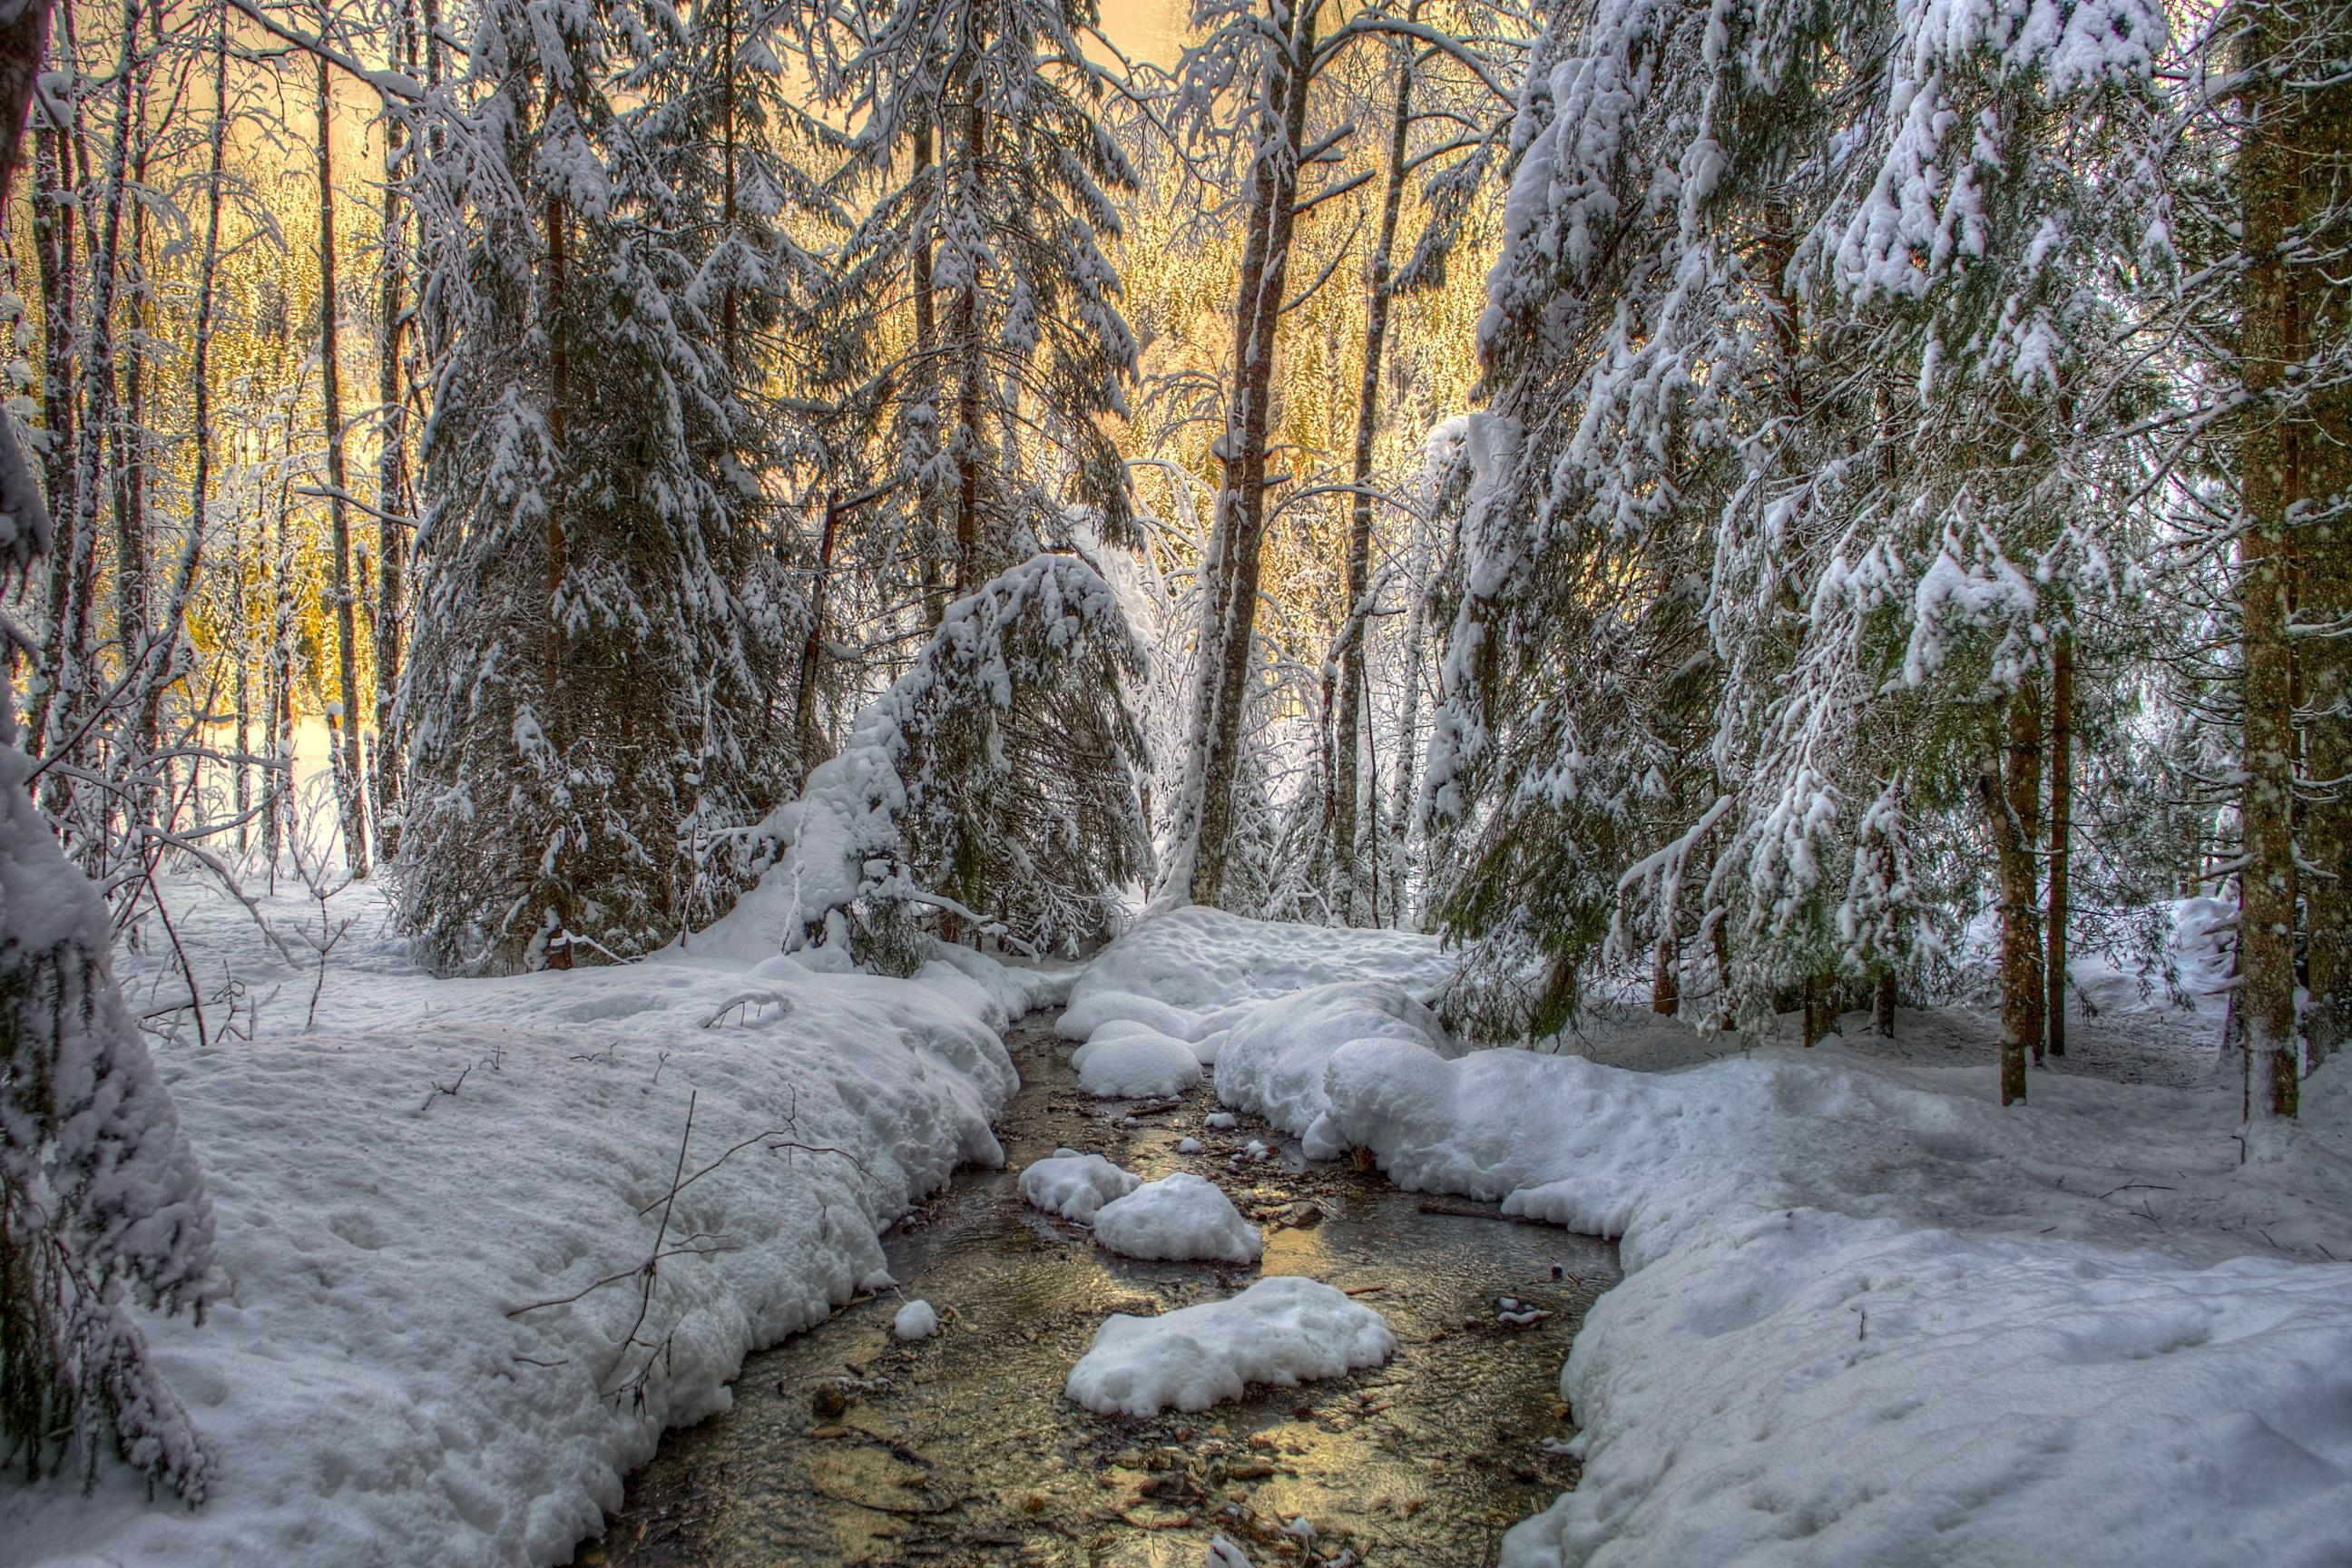 природа река снег зима деревья nature river snow winter trees без смс